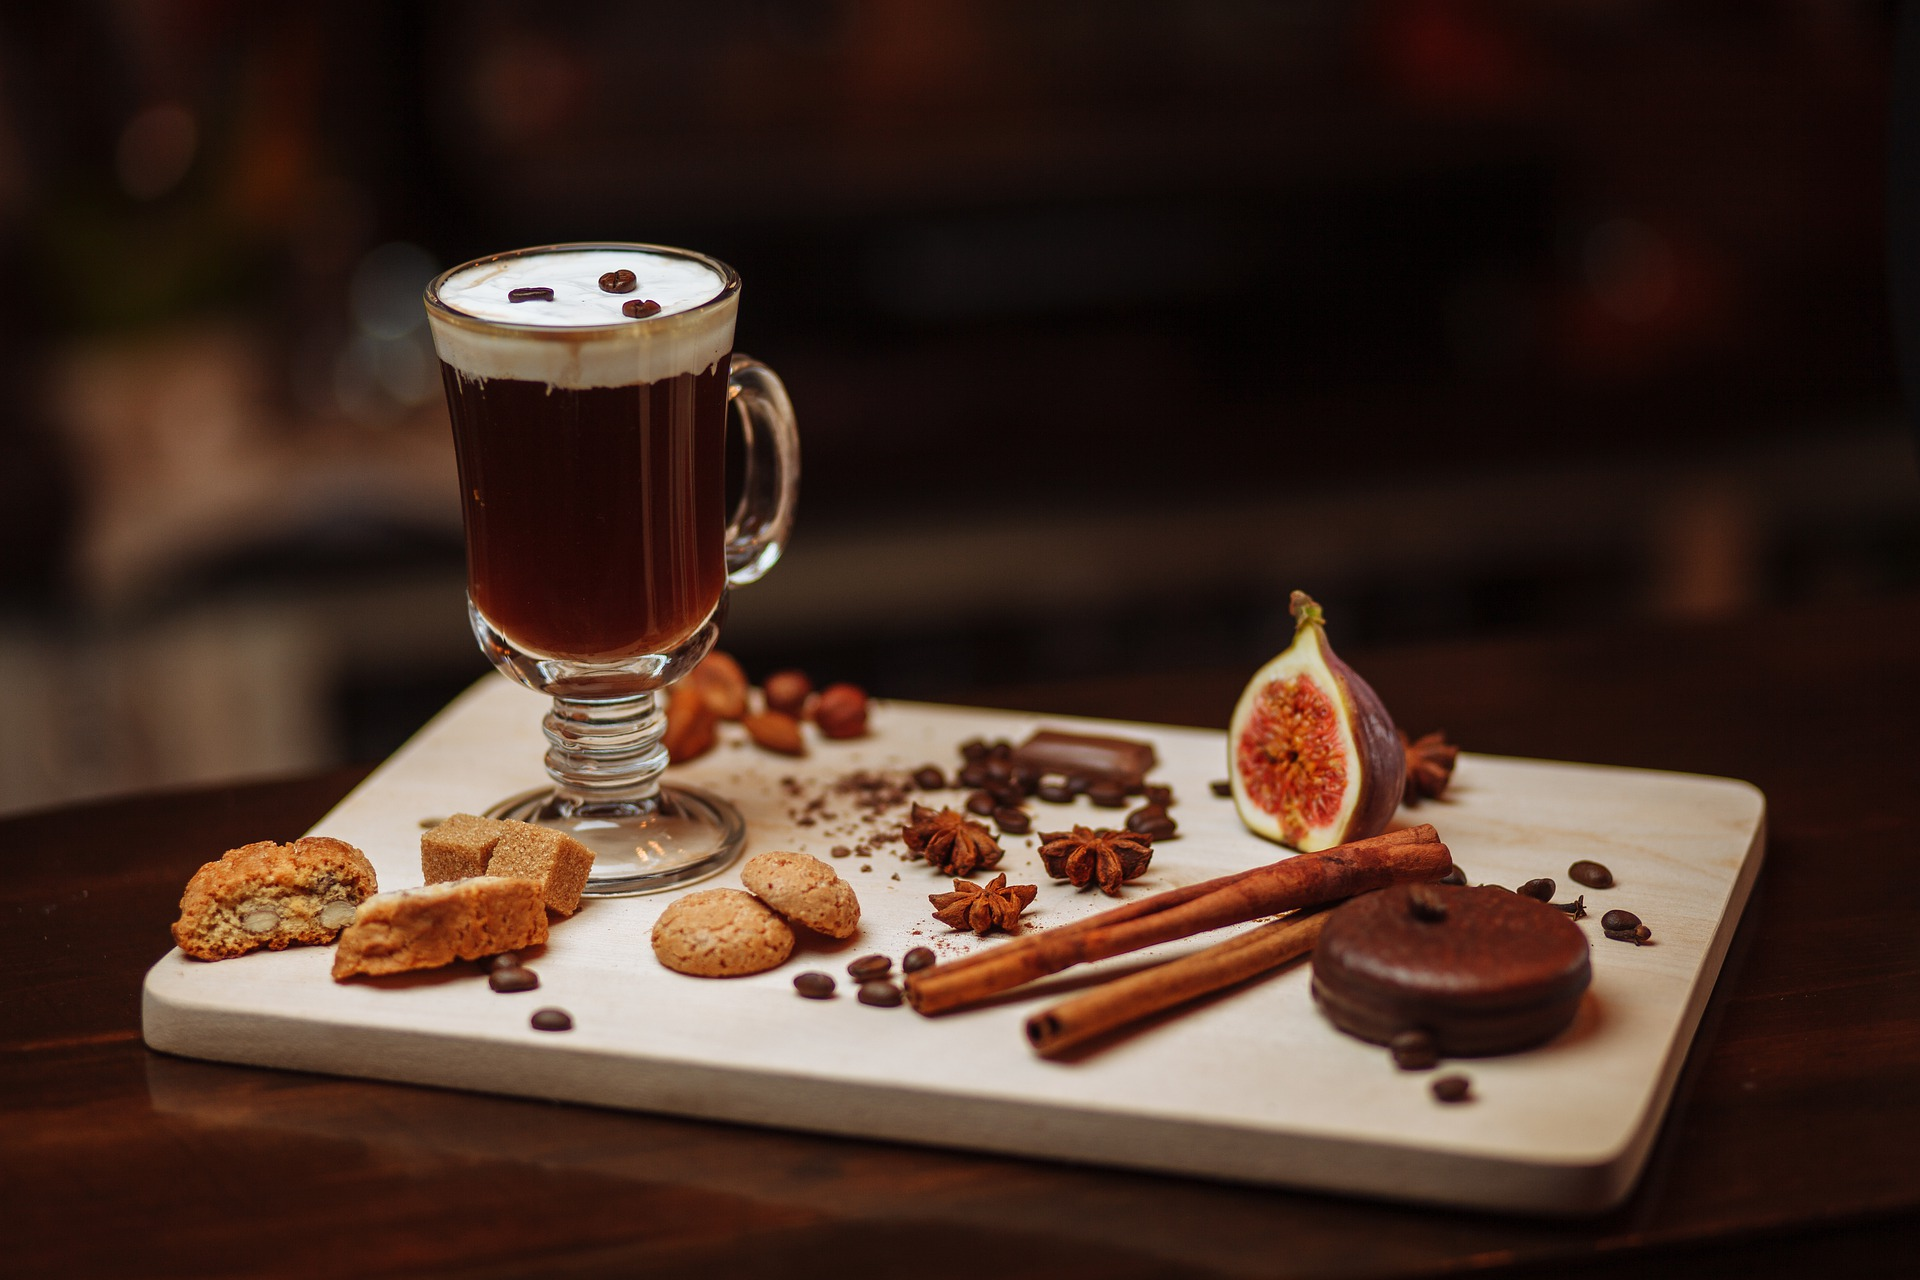 Irish Coffee Rezept - für heiß kalte Tage